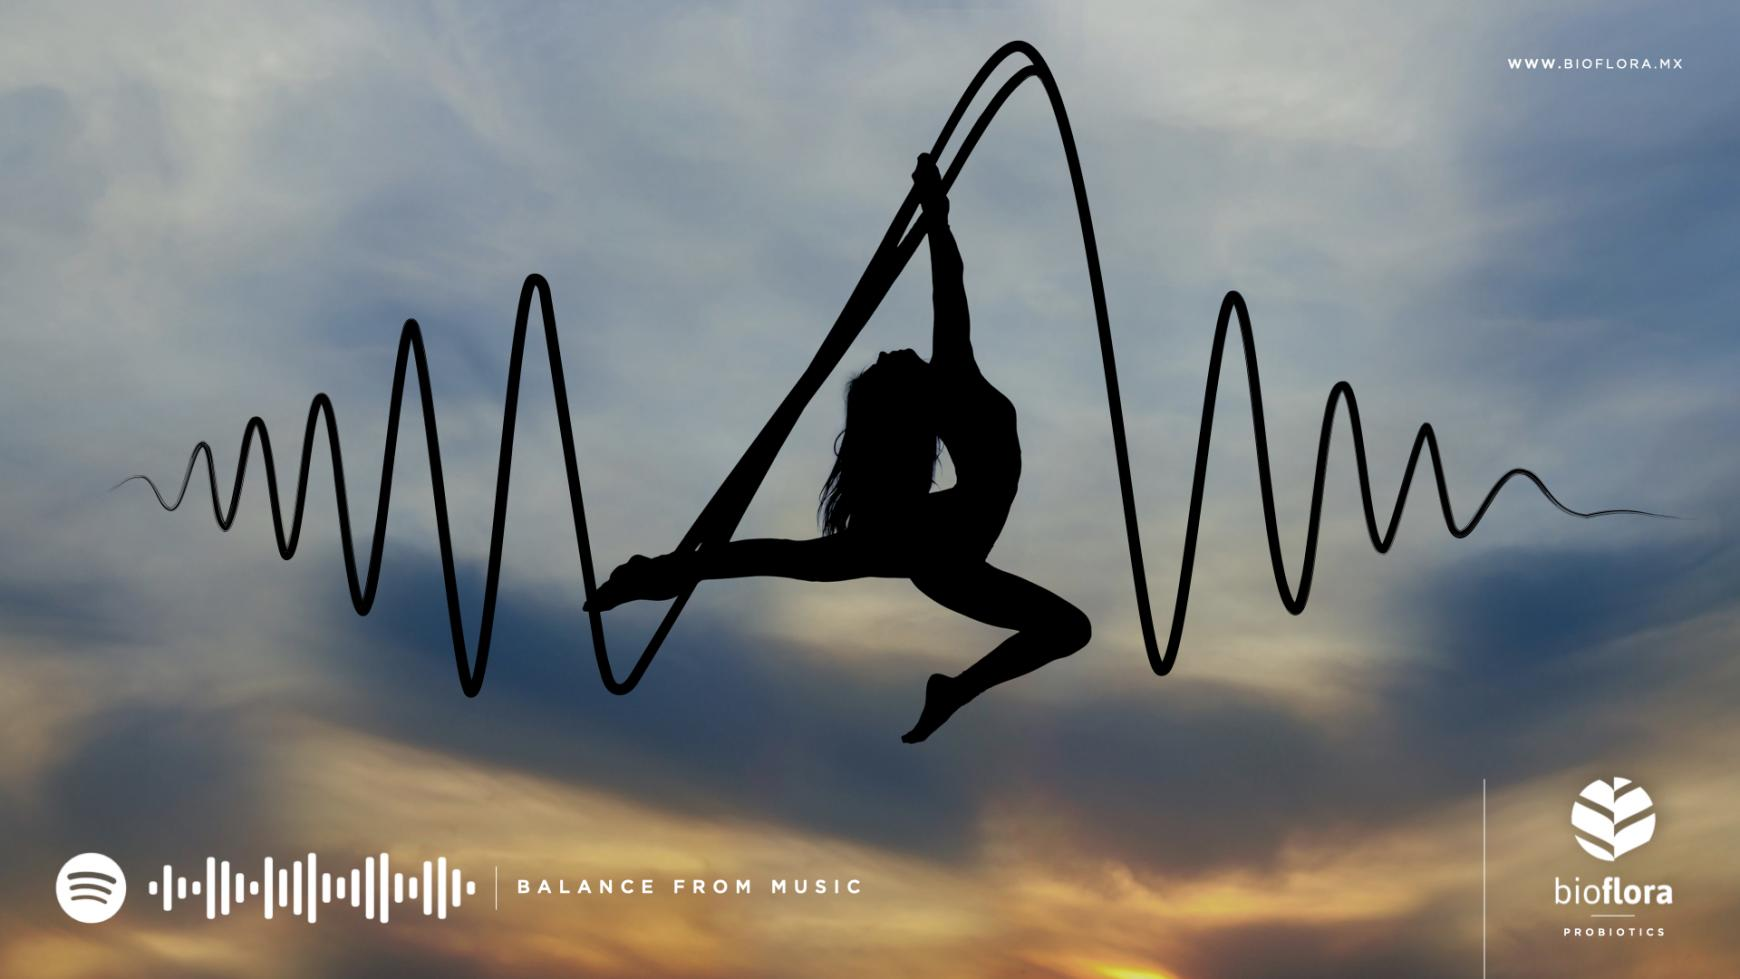 Bioflora Integrated Ad - Music for Balance